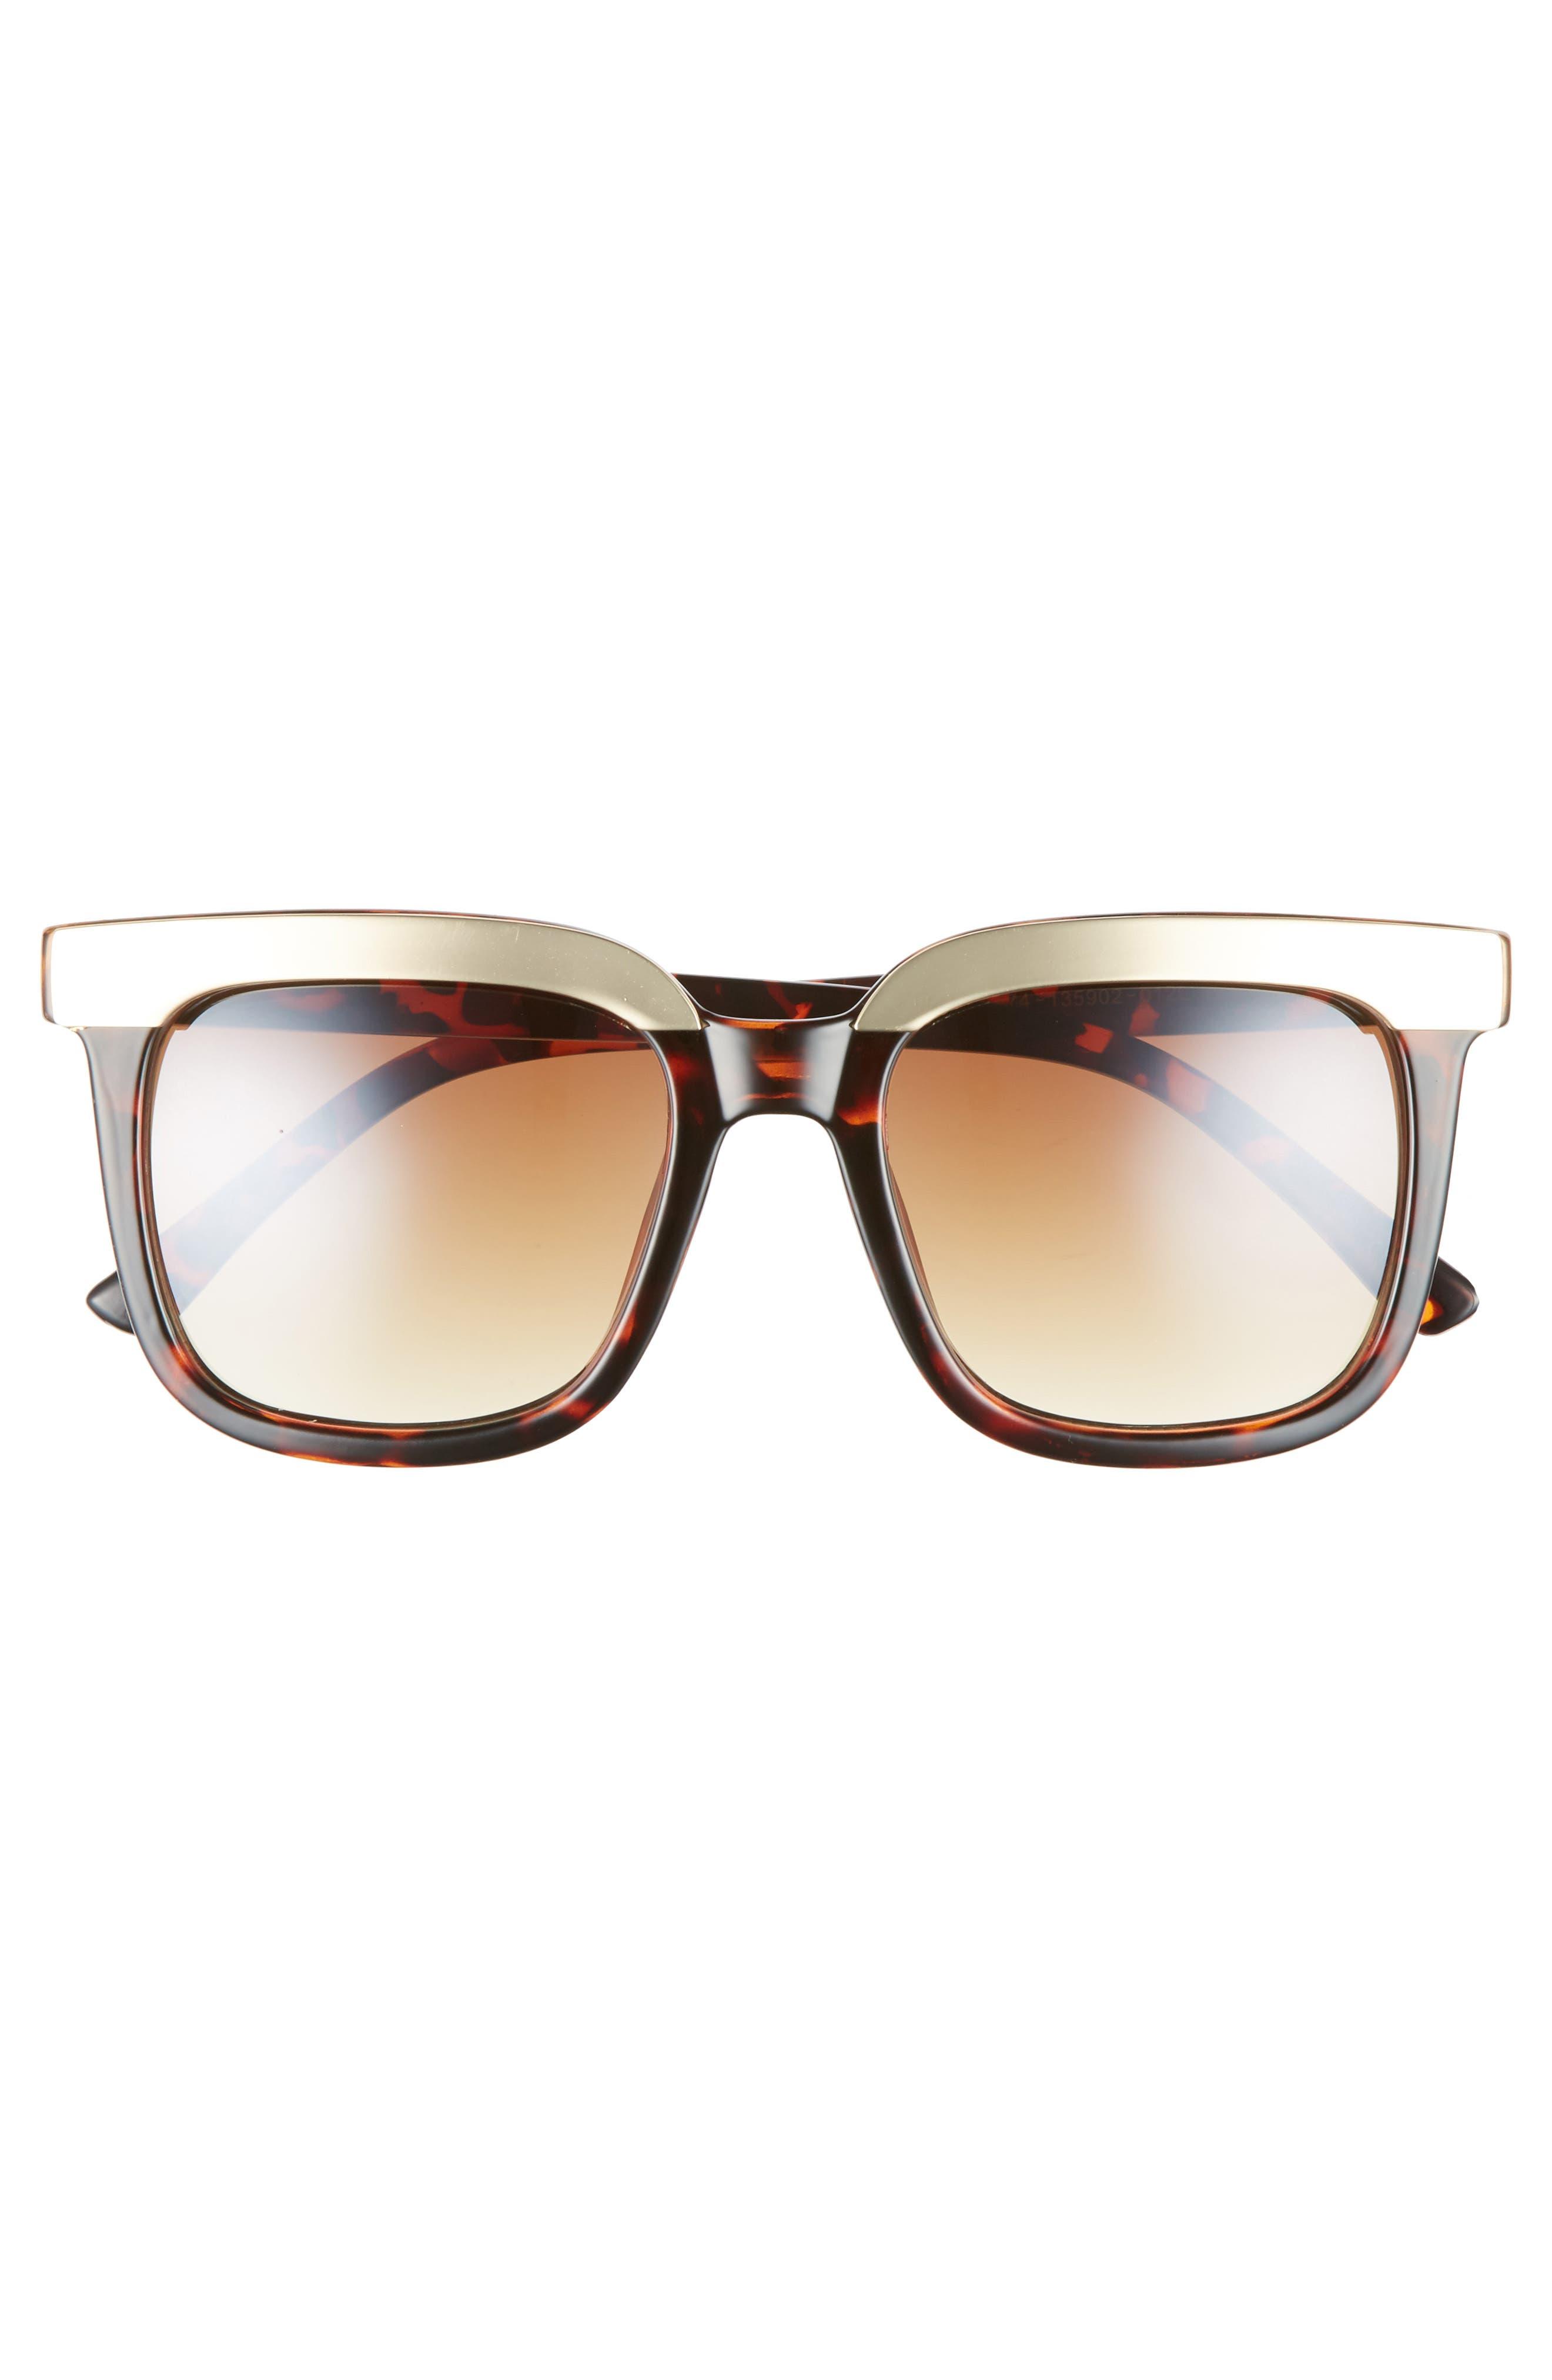 52mm Metal Dipped Square Sunglasses,                             Alternate thumbnail 3, color,